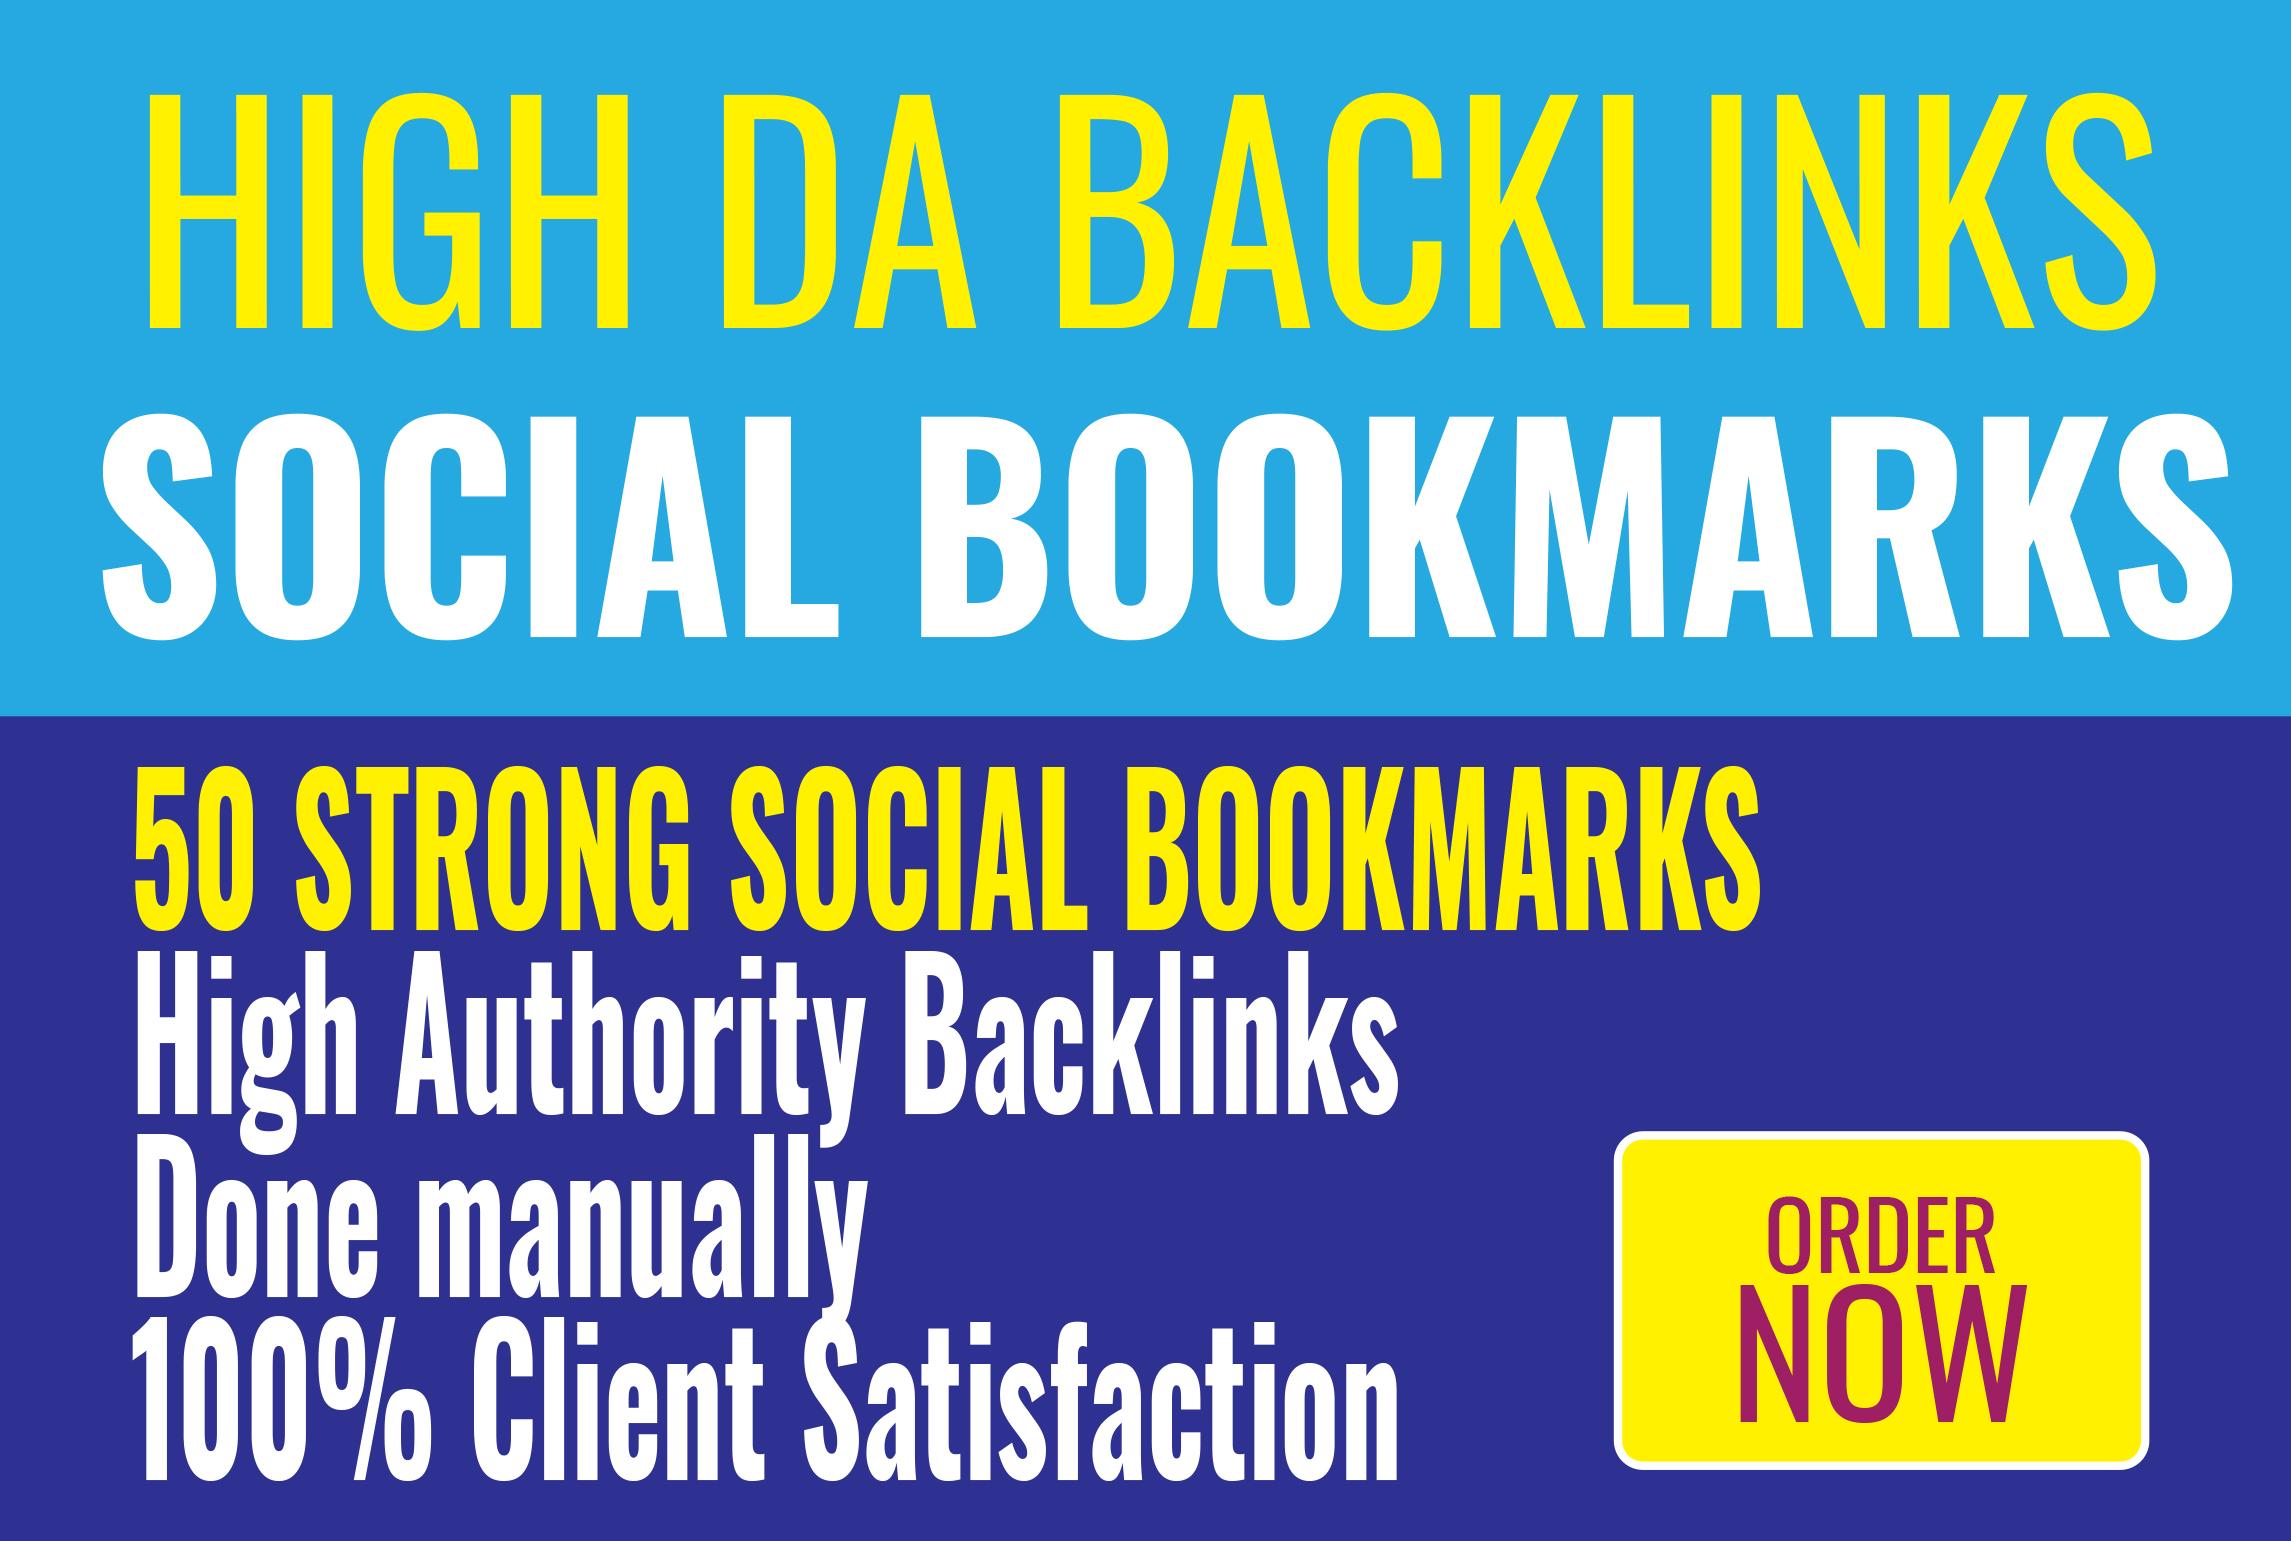 50 very strong bookmarks high DA backlinks best linkbuilding service